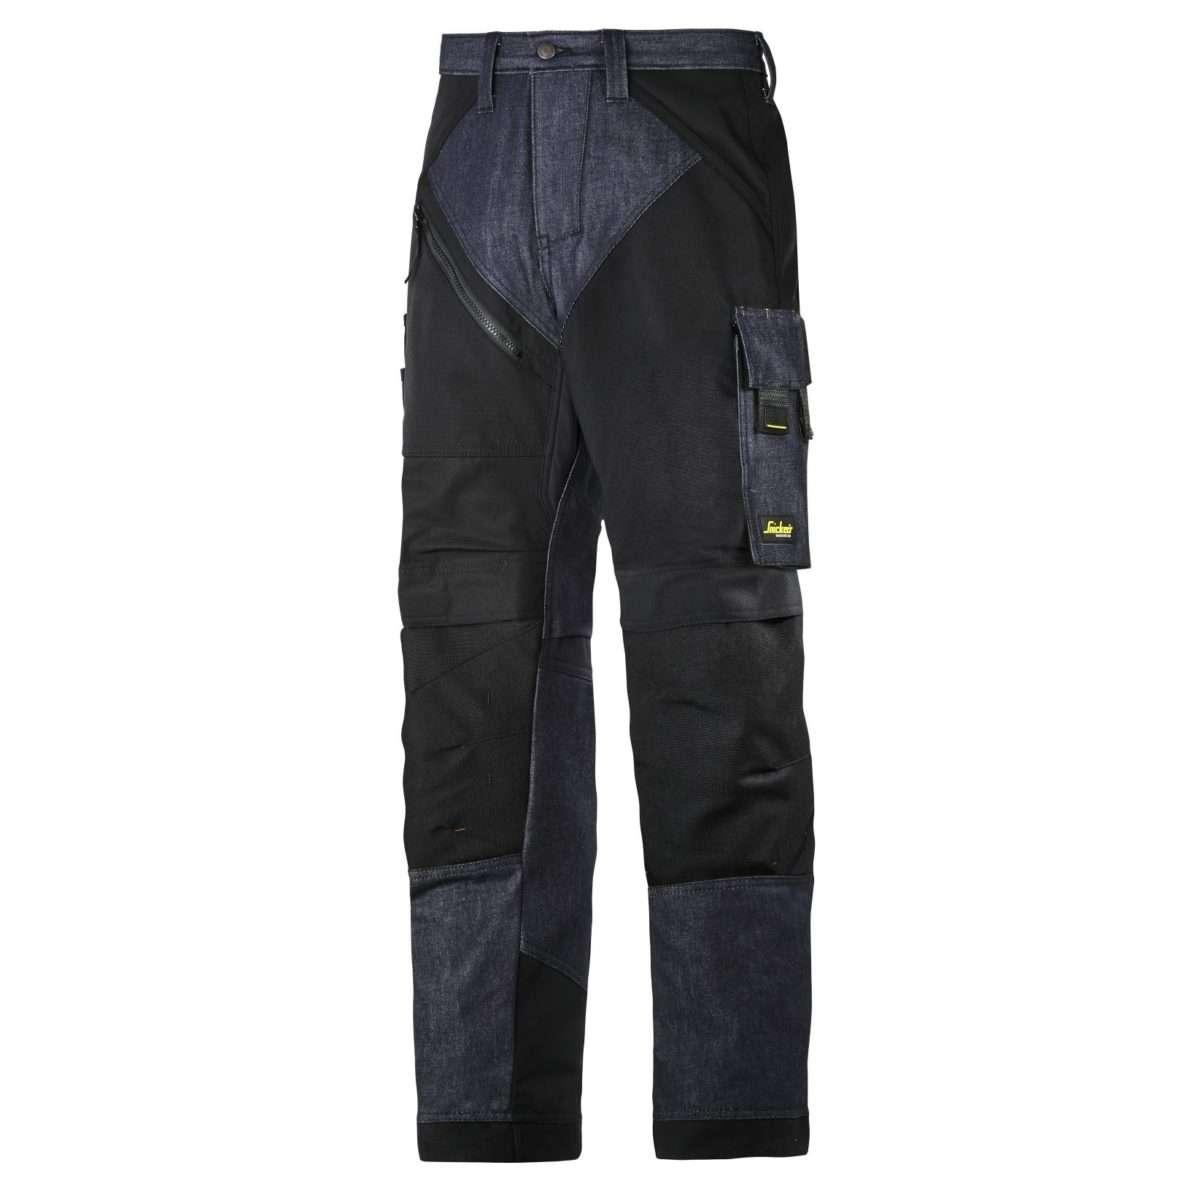 Snickers 6305 RuffWork Denim Work Trousers